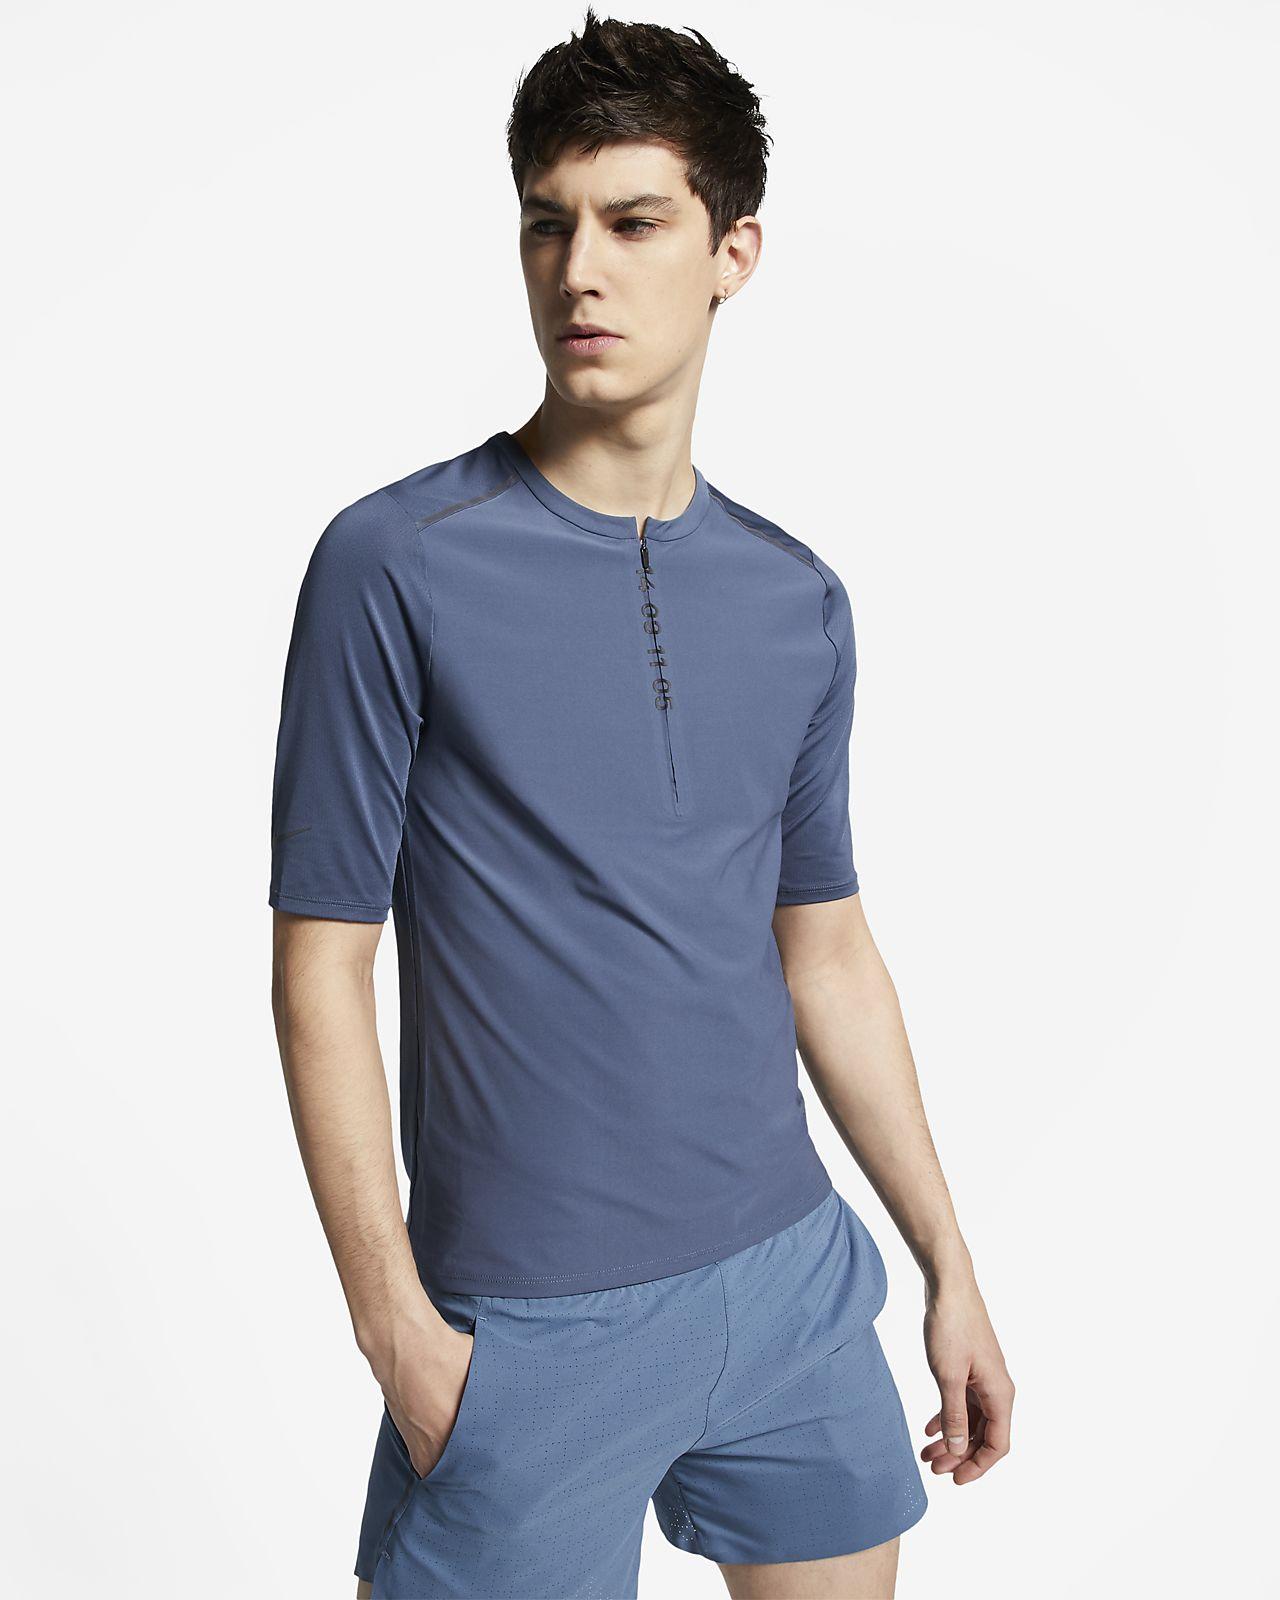 Nike Tech Pack Camiseta de running de manga corta y media cremallera - Hombre